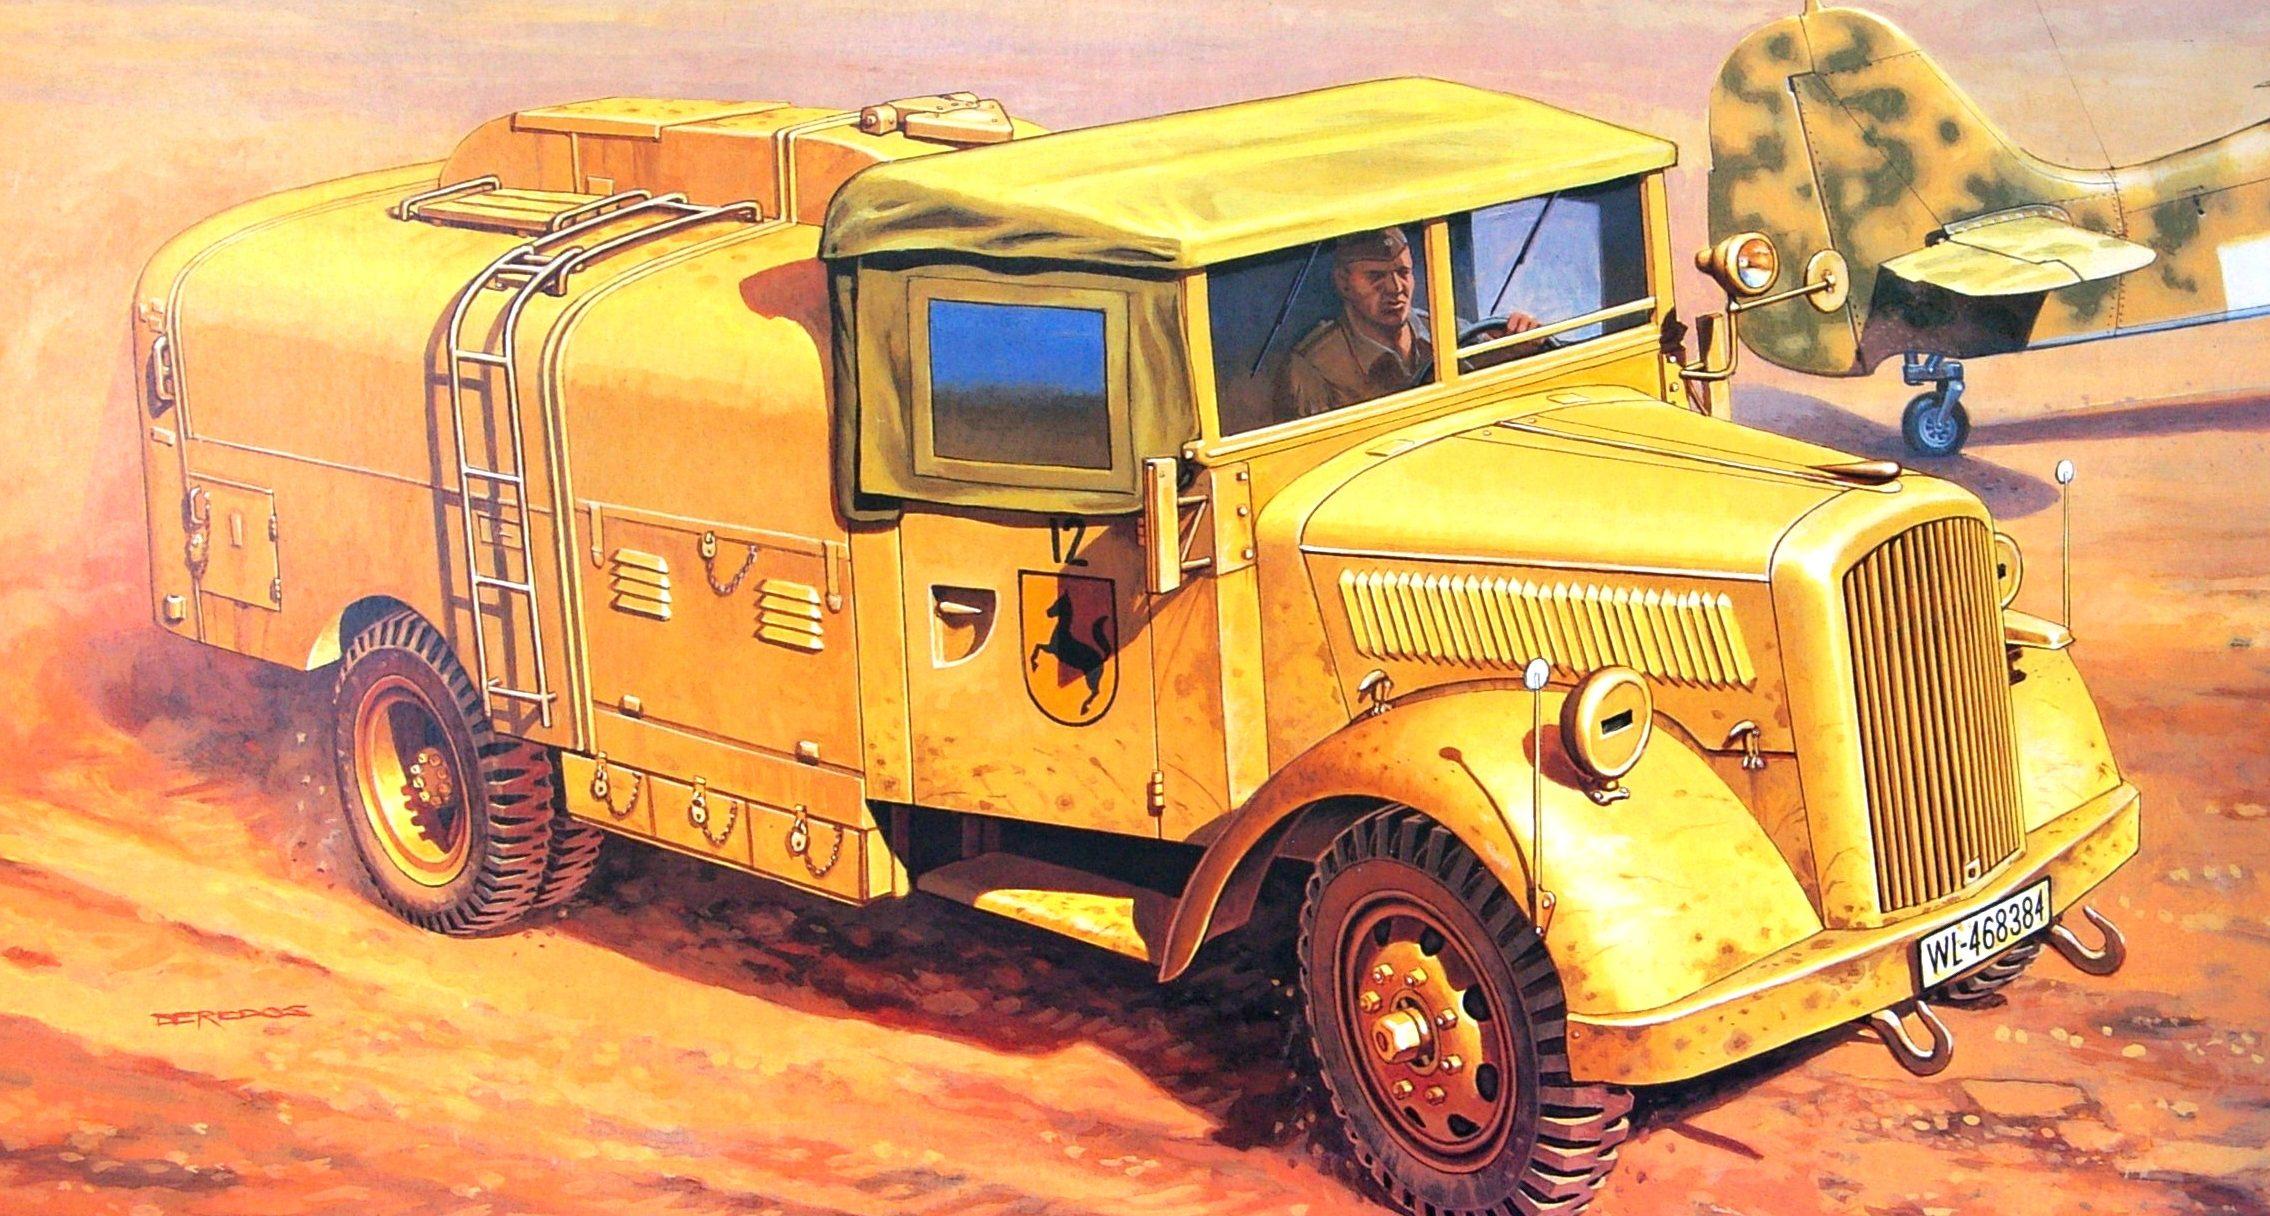 Deredos Andrzej. Самолетный заправщик Opel Blitz Kfz.385 Tankwagen.